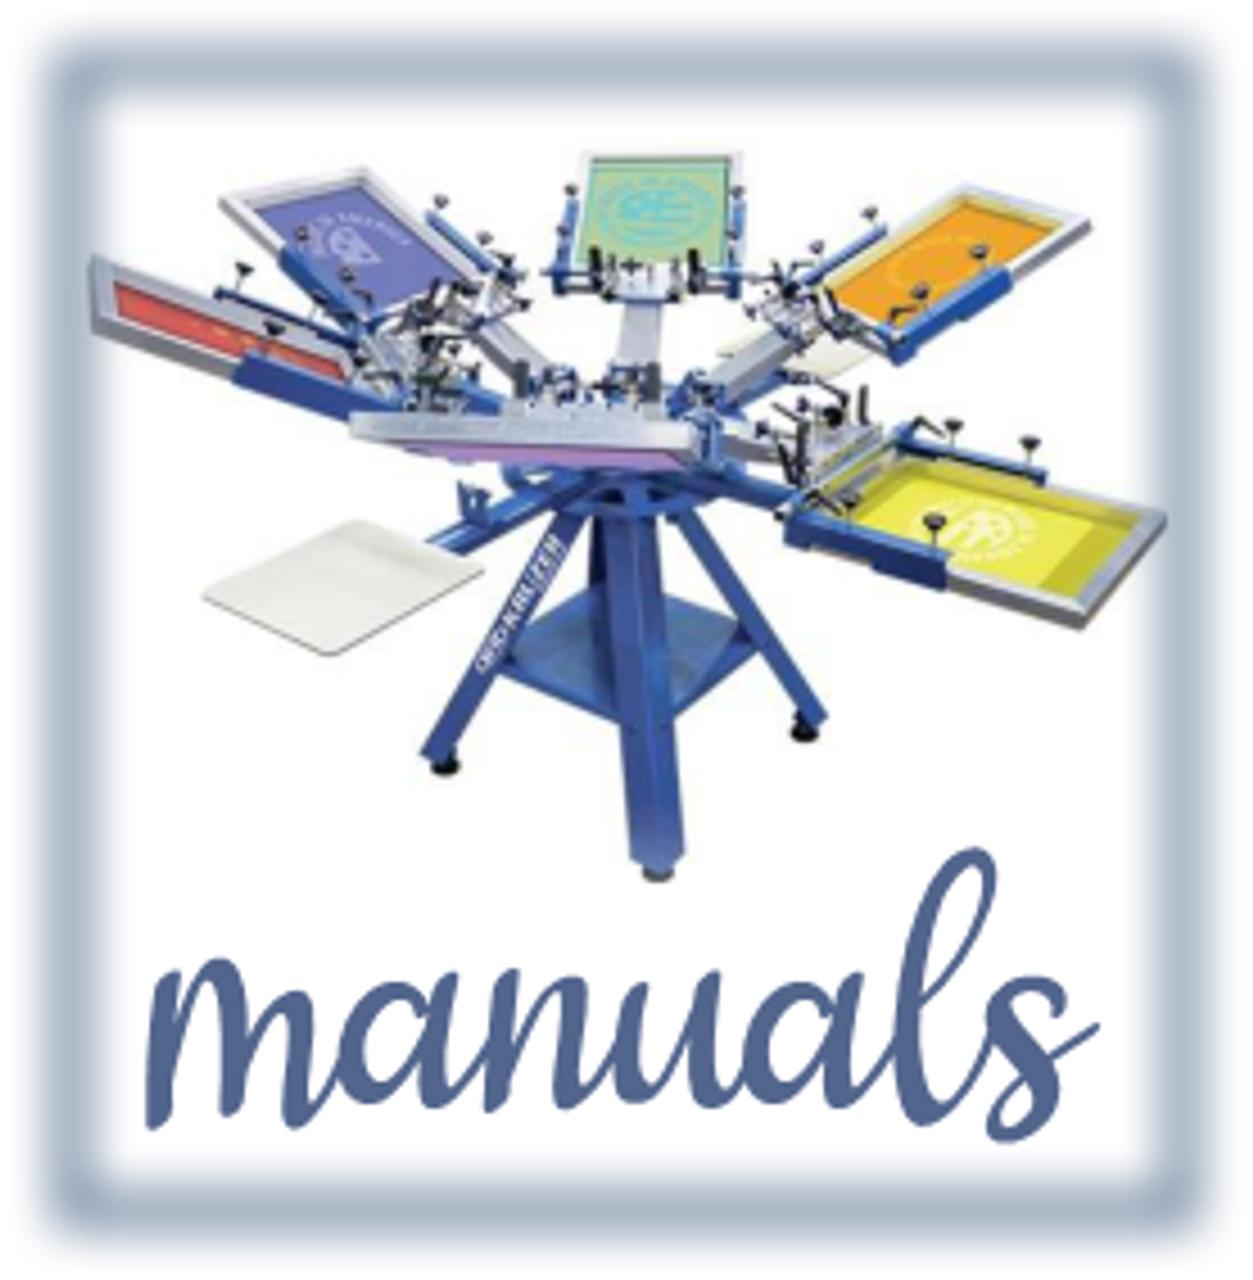 Manual Textile Presses